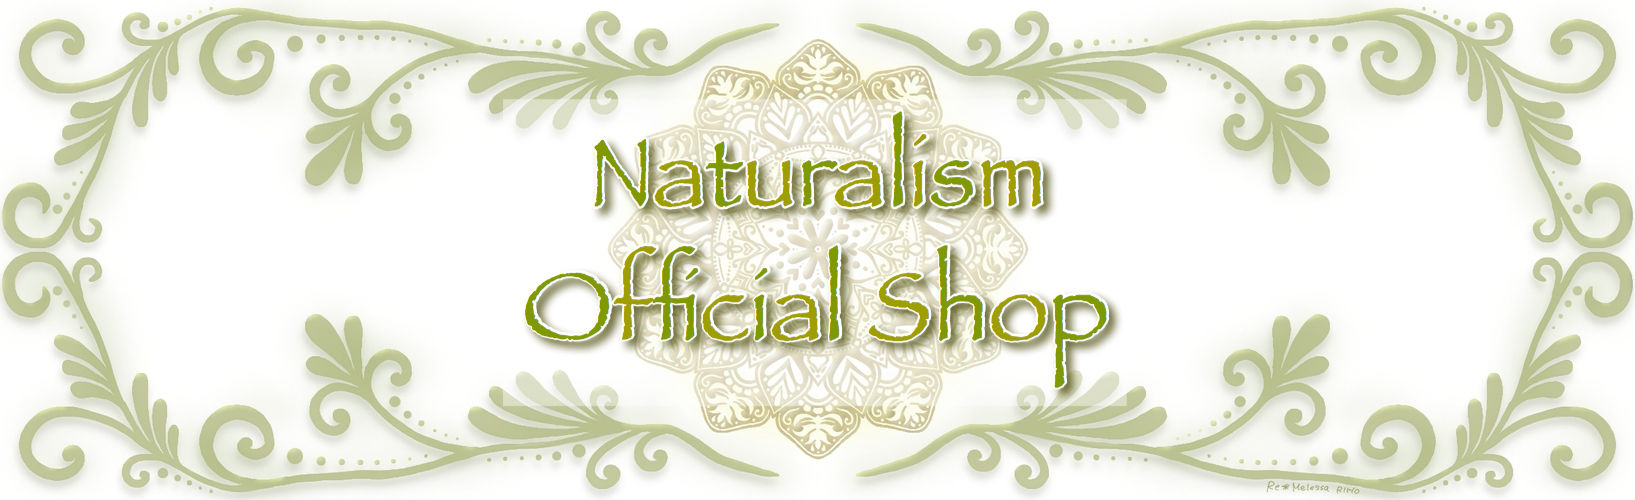 Naturalism official shop